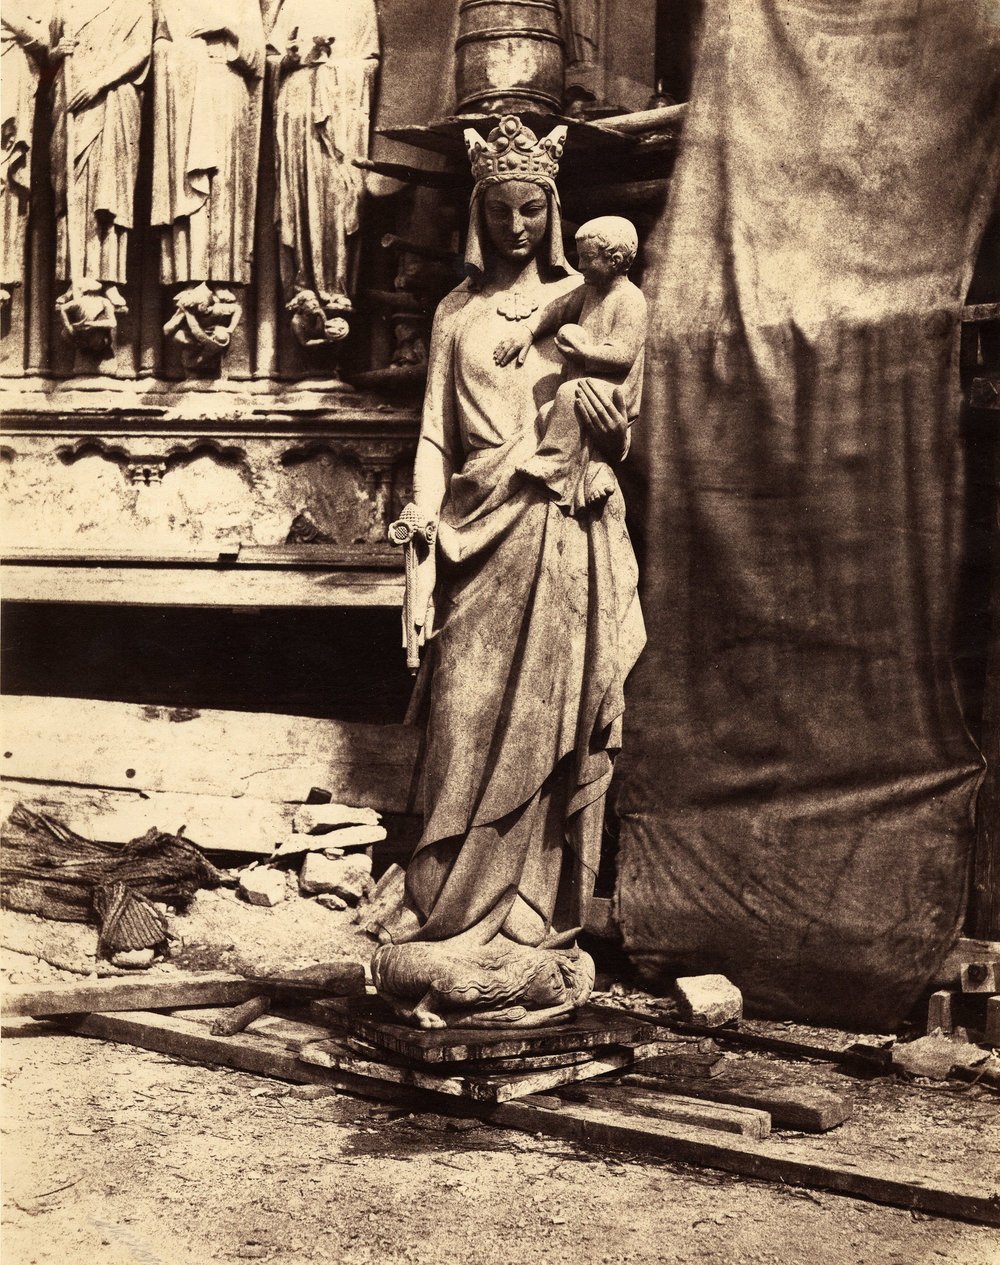 Auguste_Mestral,_Sculpture_of_Virgin_and_Child,_Notre_Dame,_Paris,_ca._1851.jpg